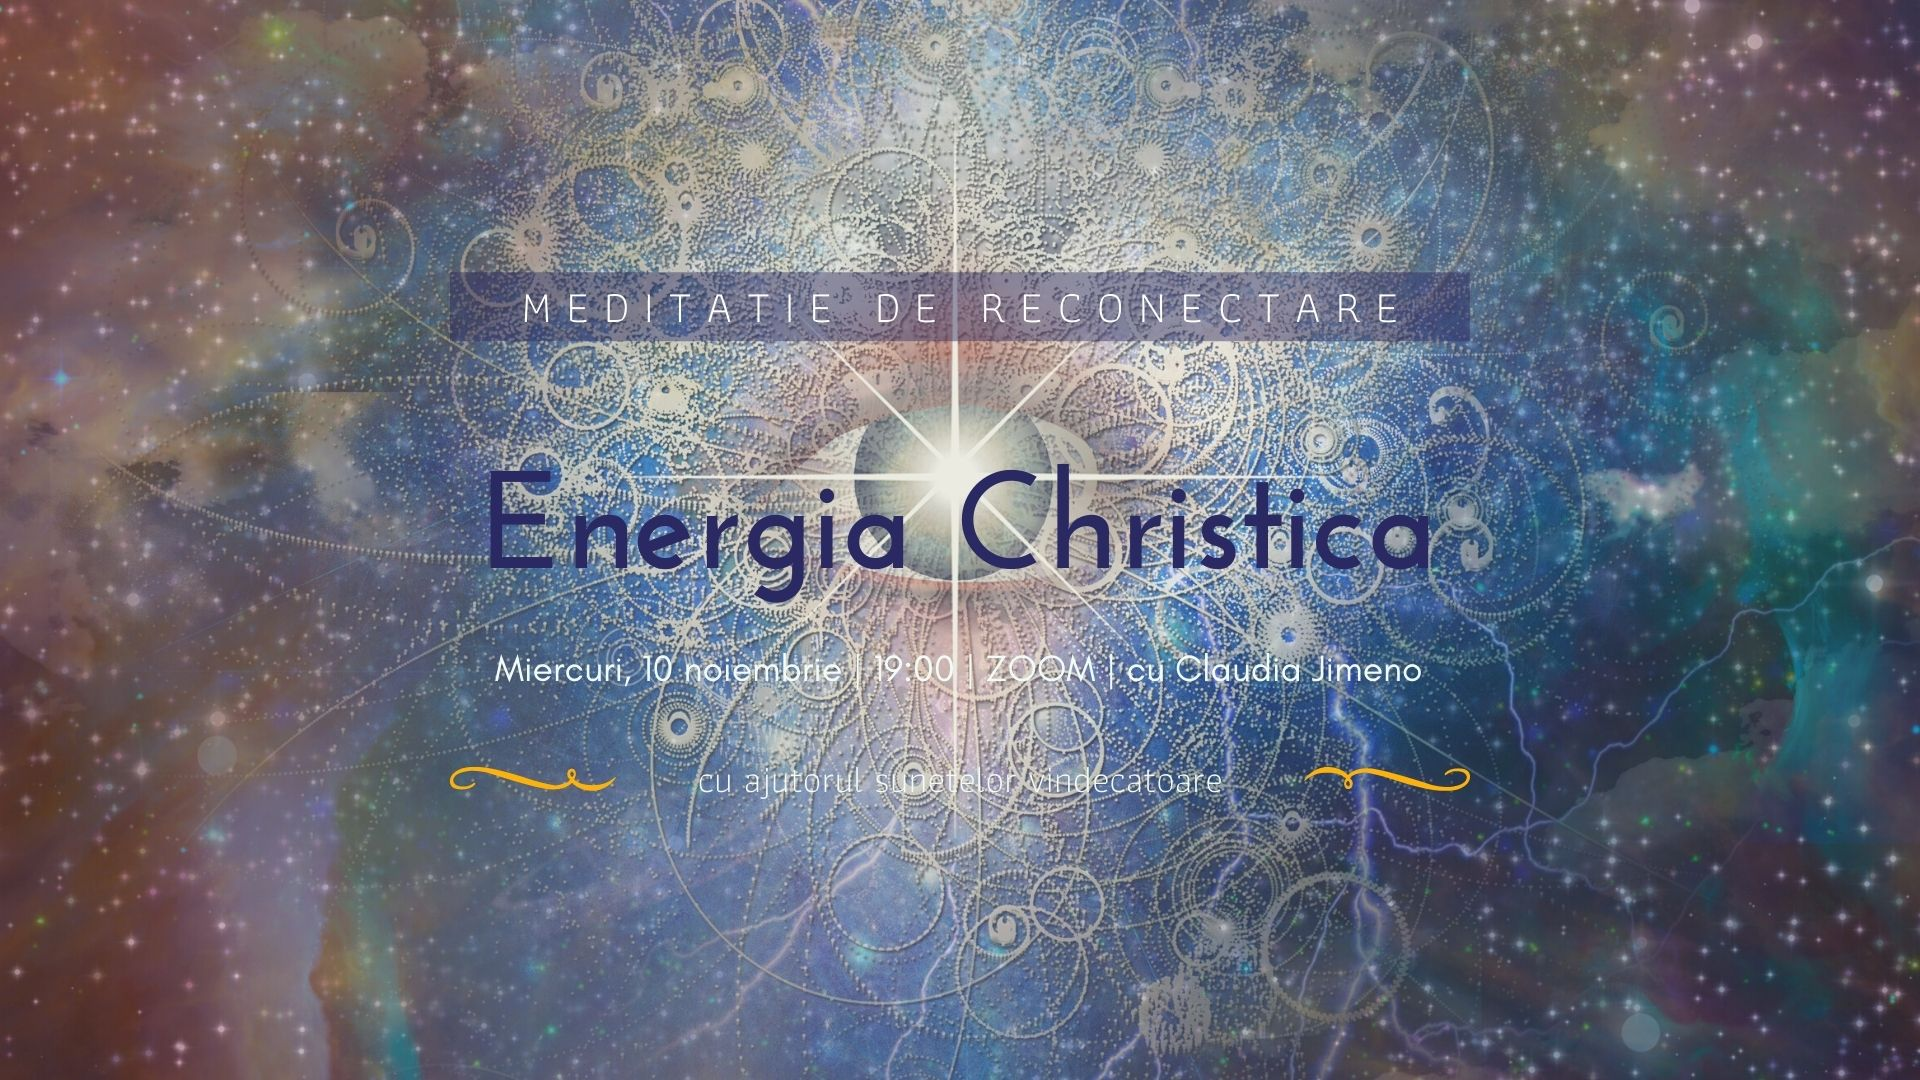 Meditatie de conectare cu energia Christica